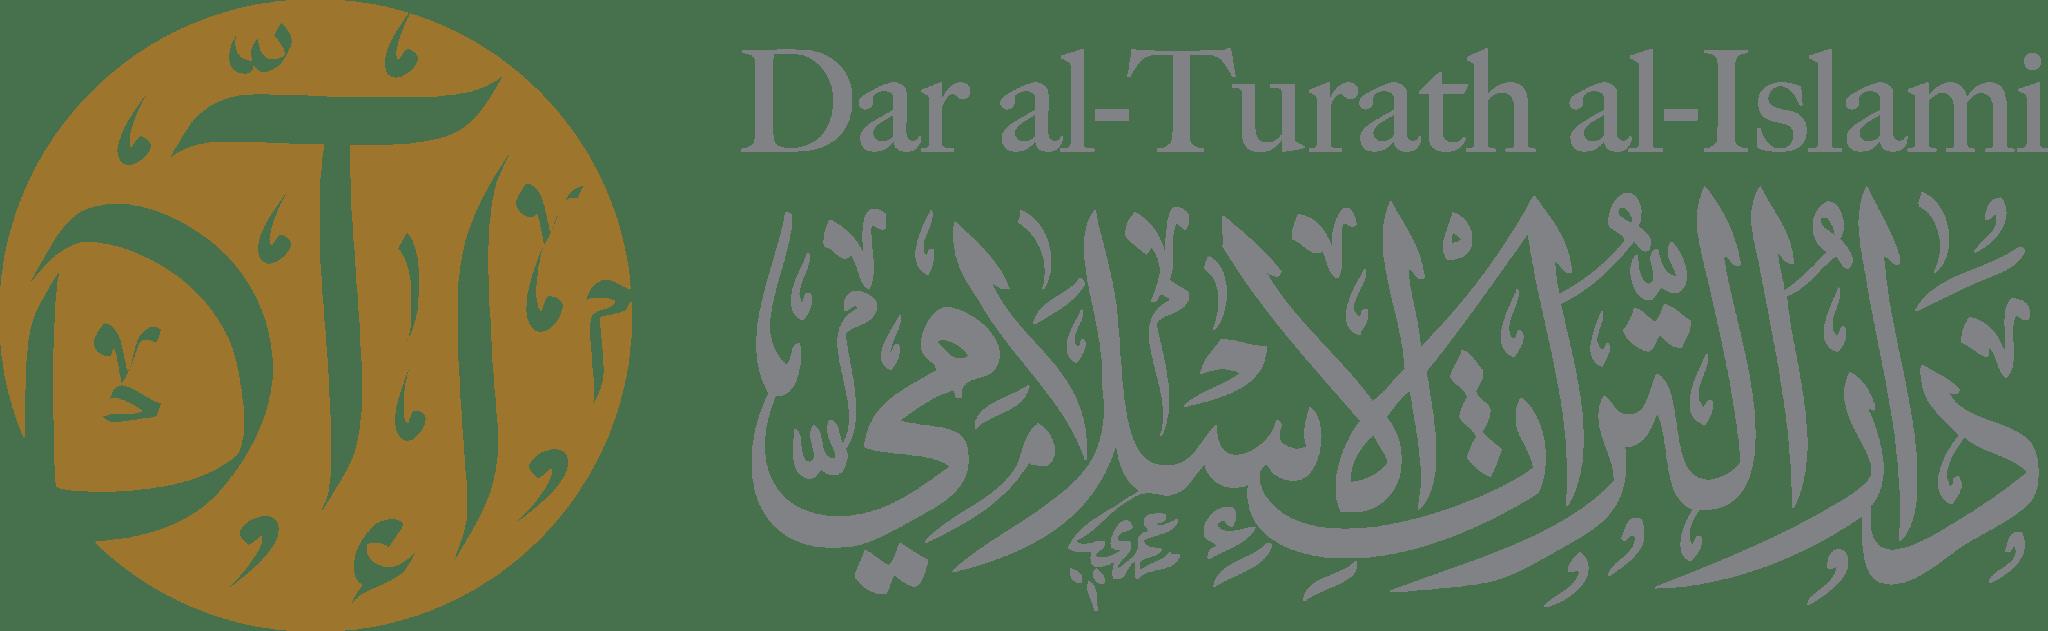 dti gold logo